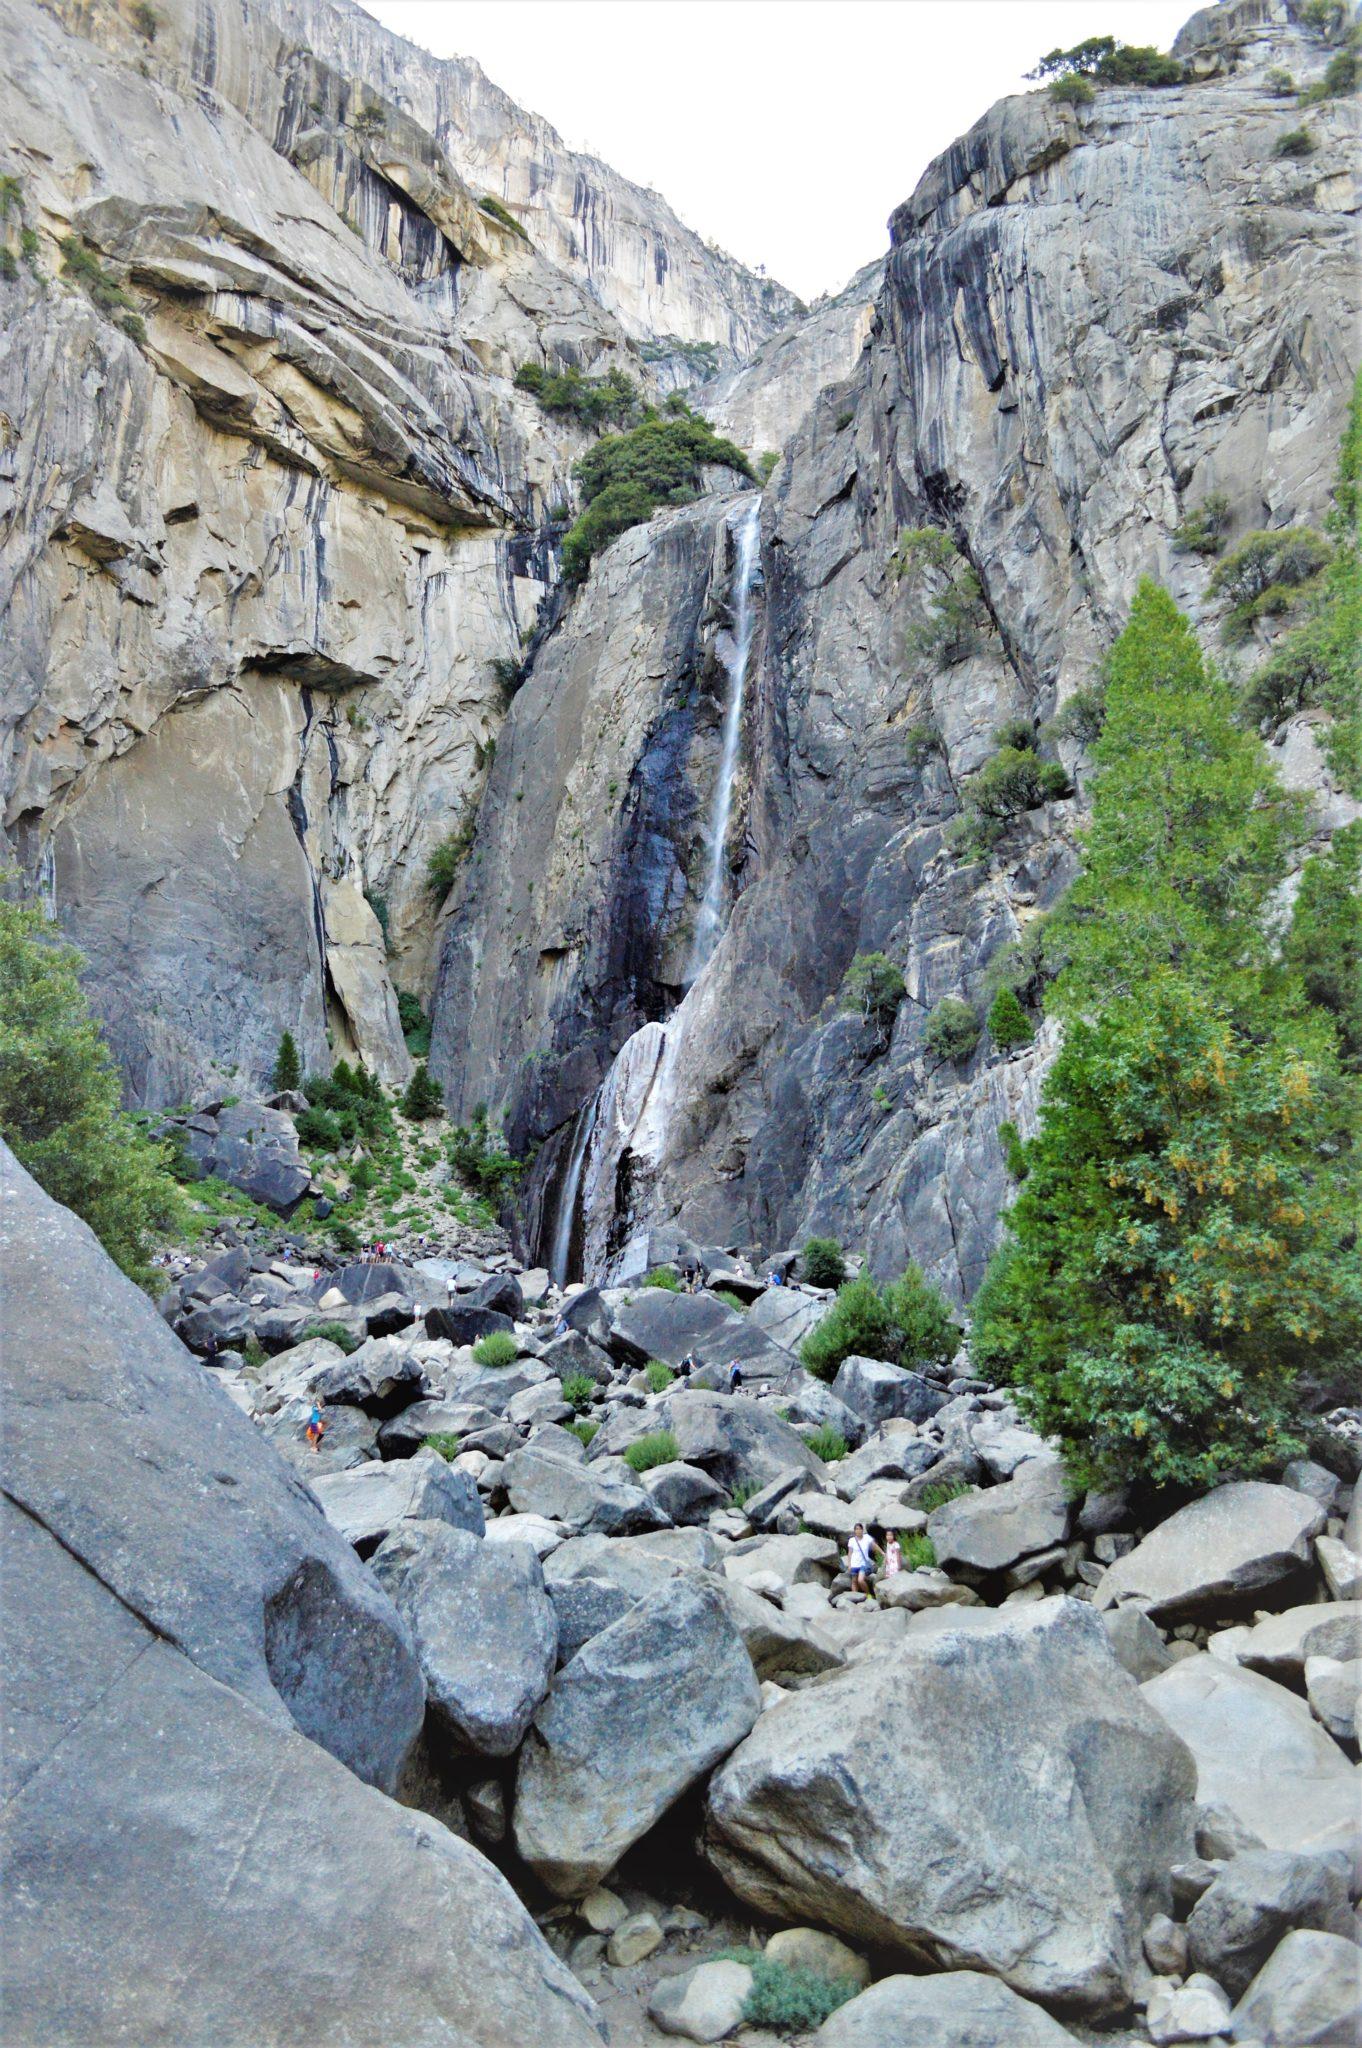 Yosemite lower falls, California, things to do at Yosemite